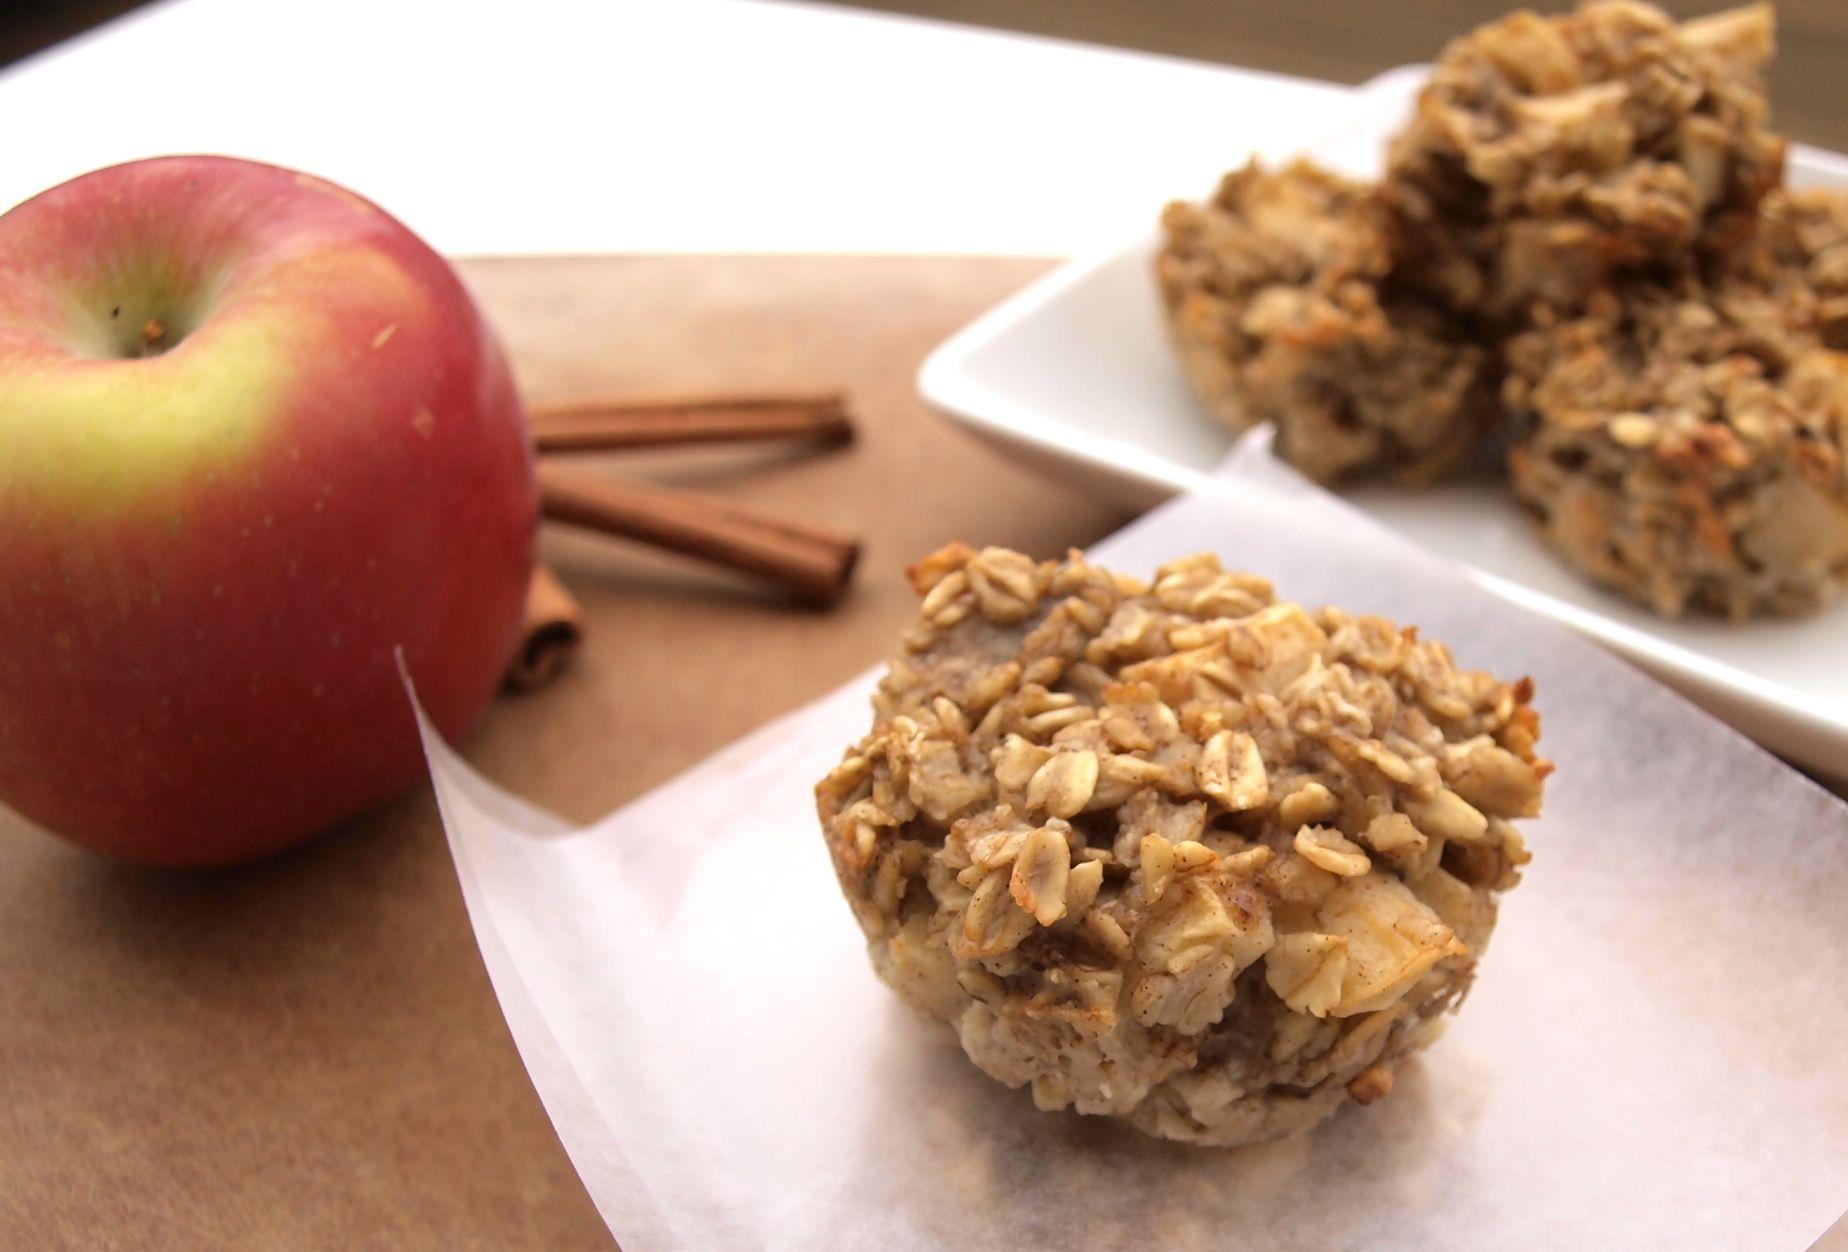 Baked Apple Cinnamon Oatmeal Recipe